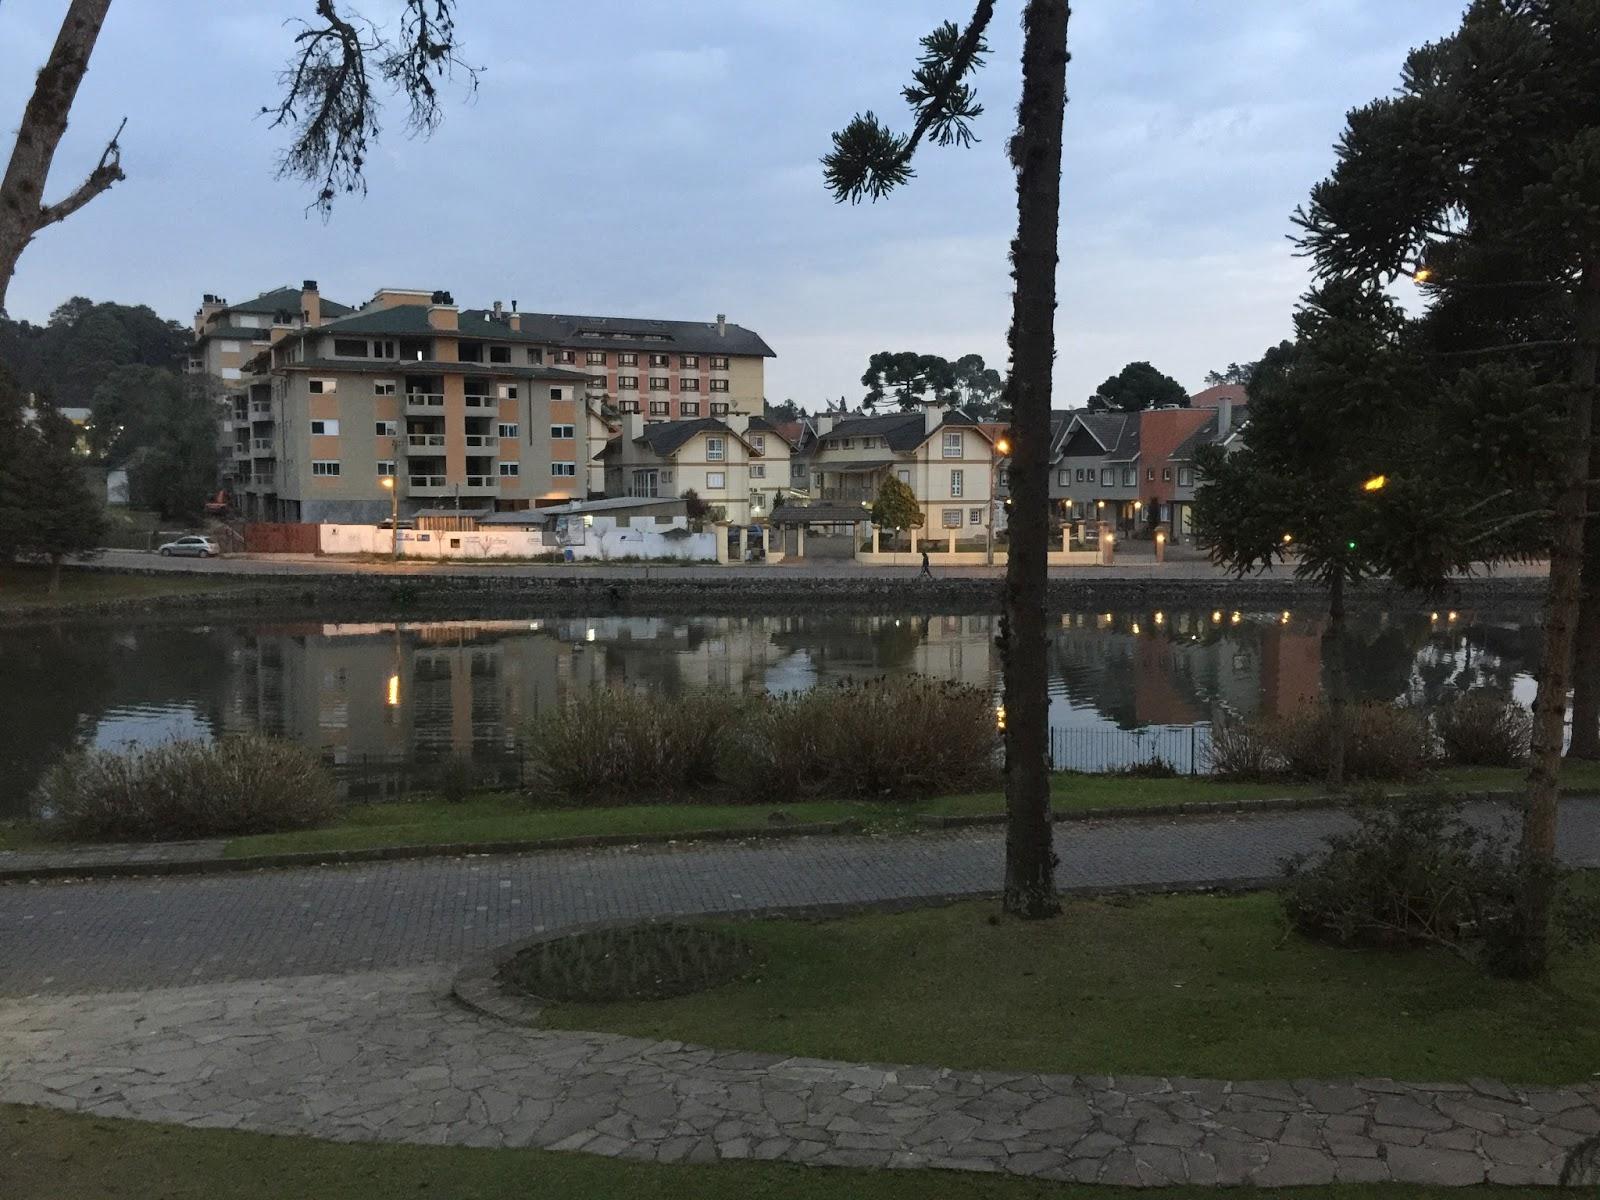 lago Grande Hotel Canela